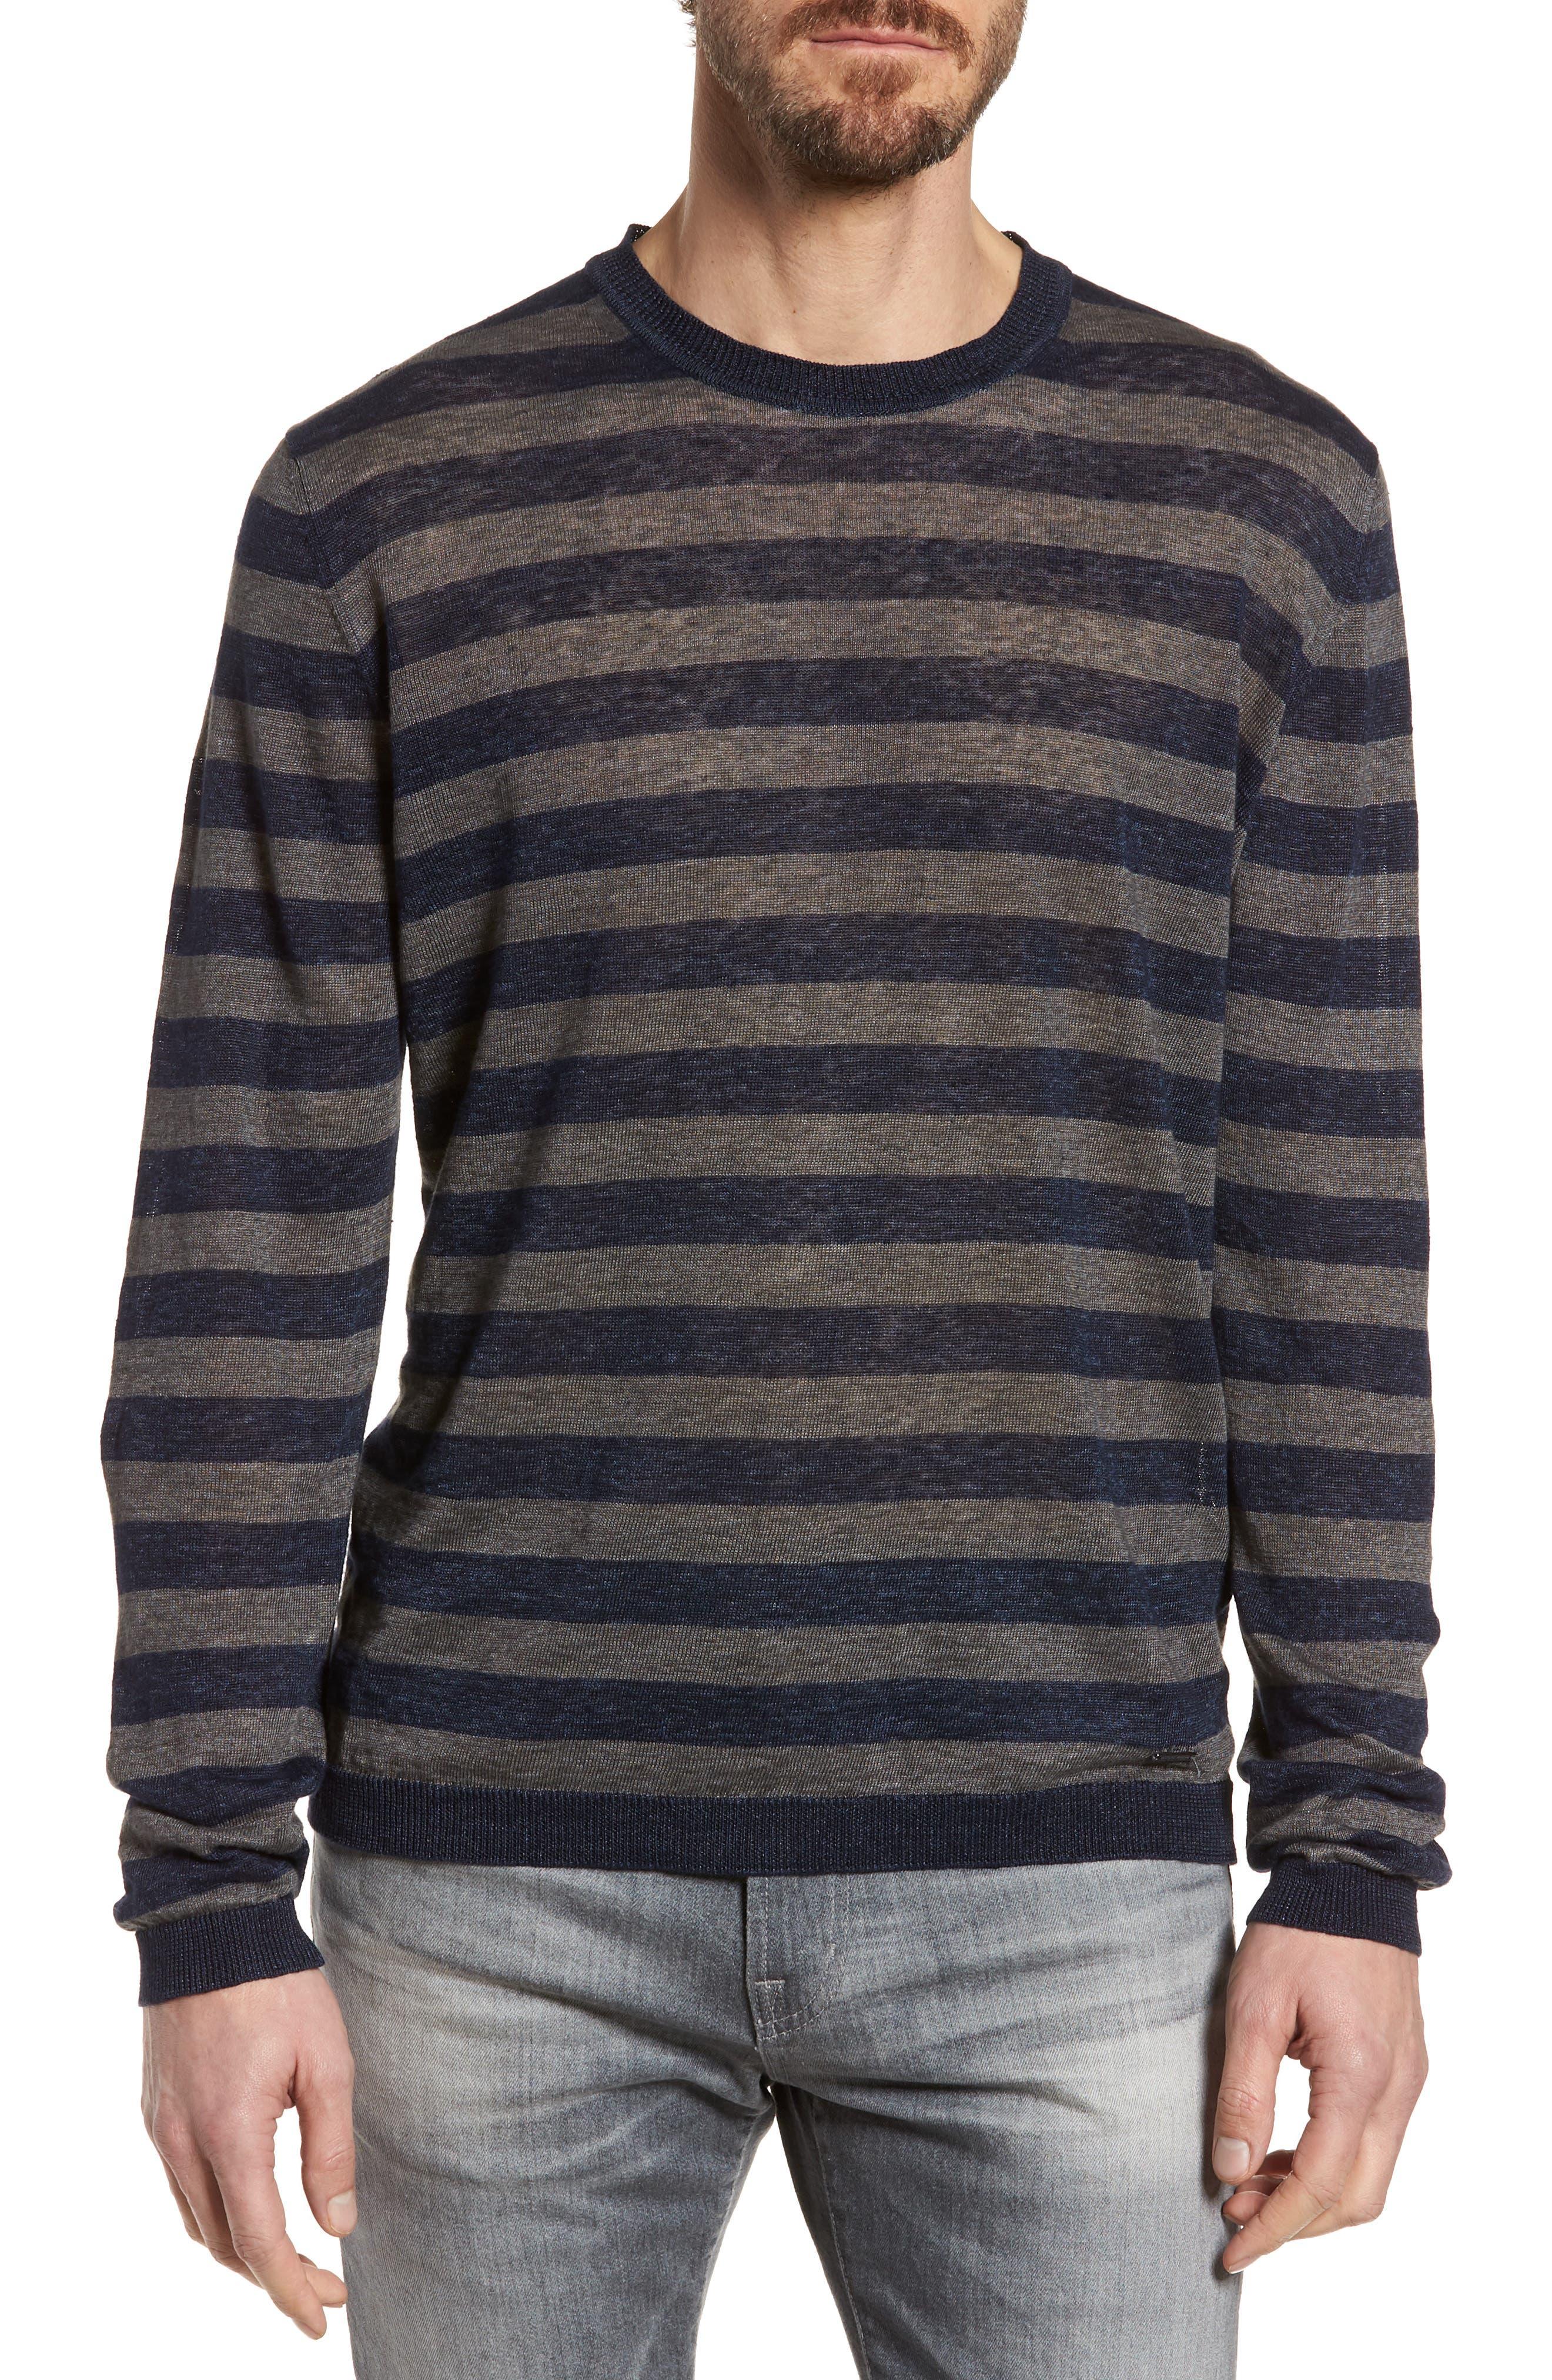 & Bros. Stripe Linen Sweater,                         Main,                         color, Navy Stripe